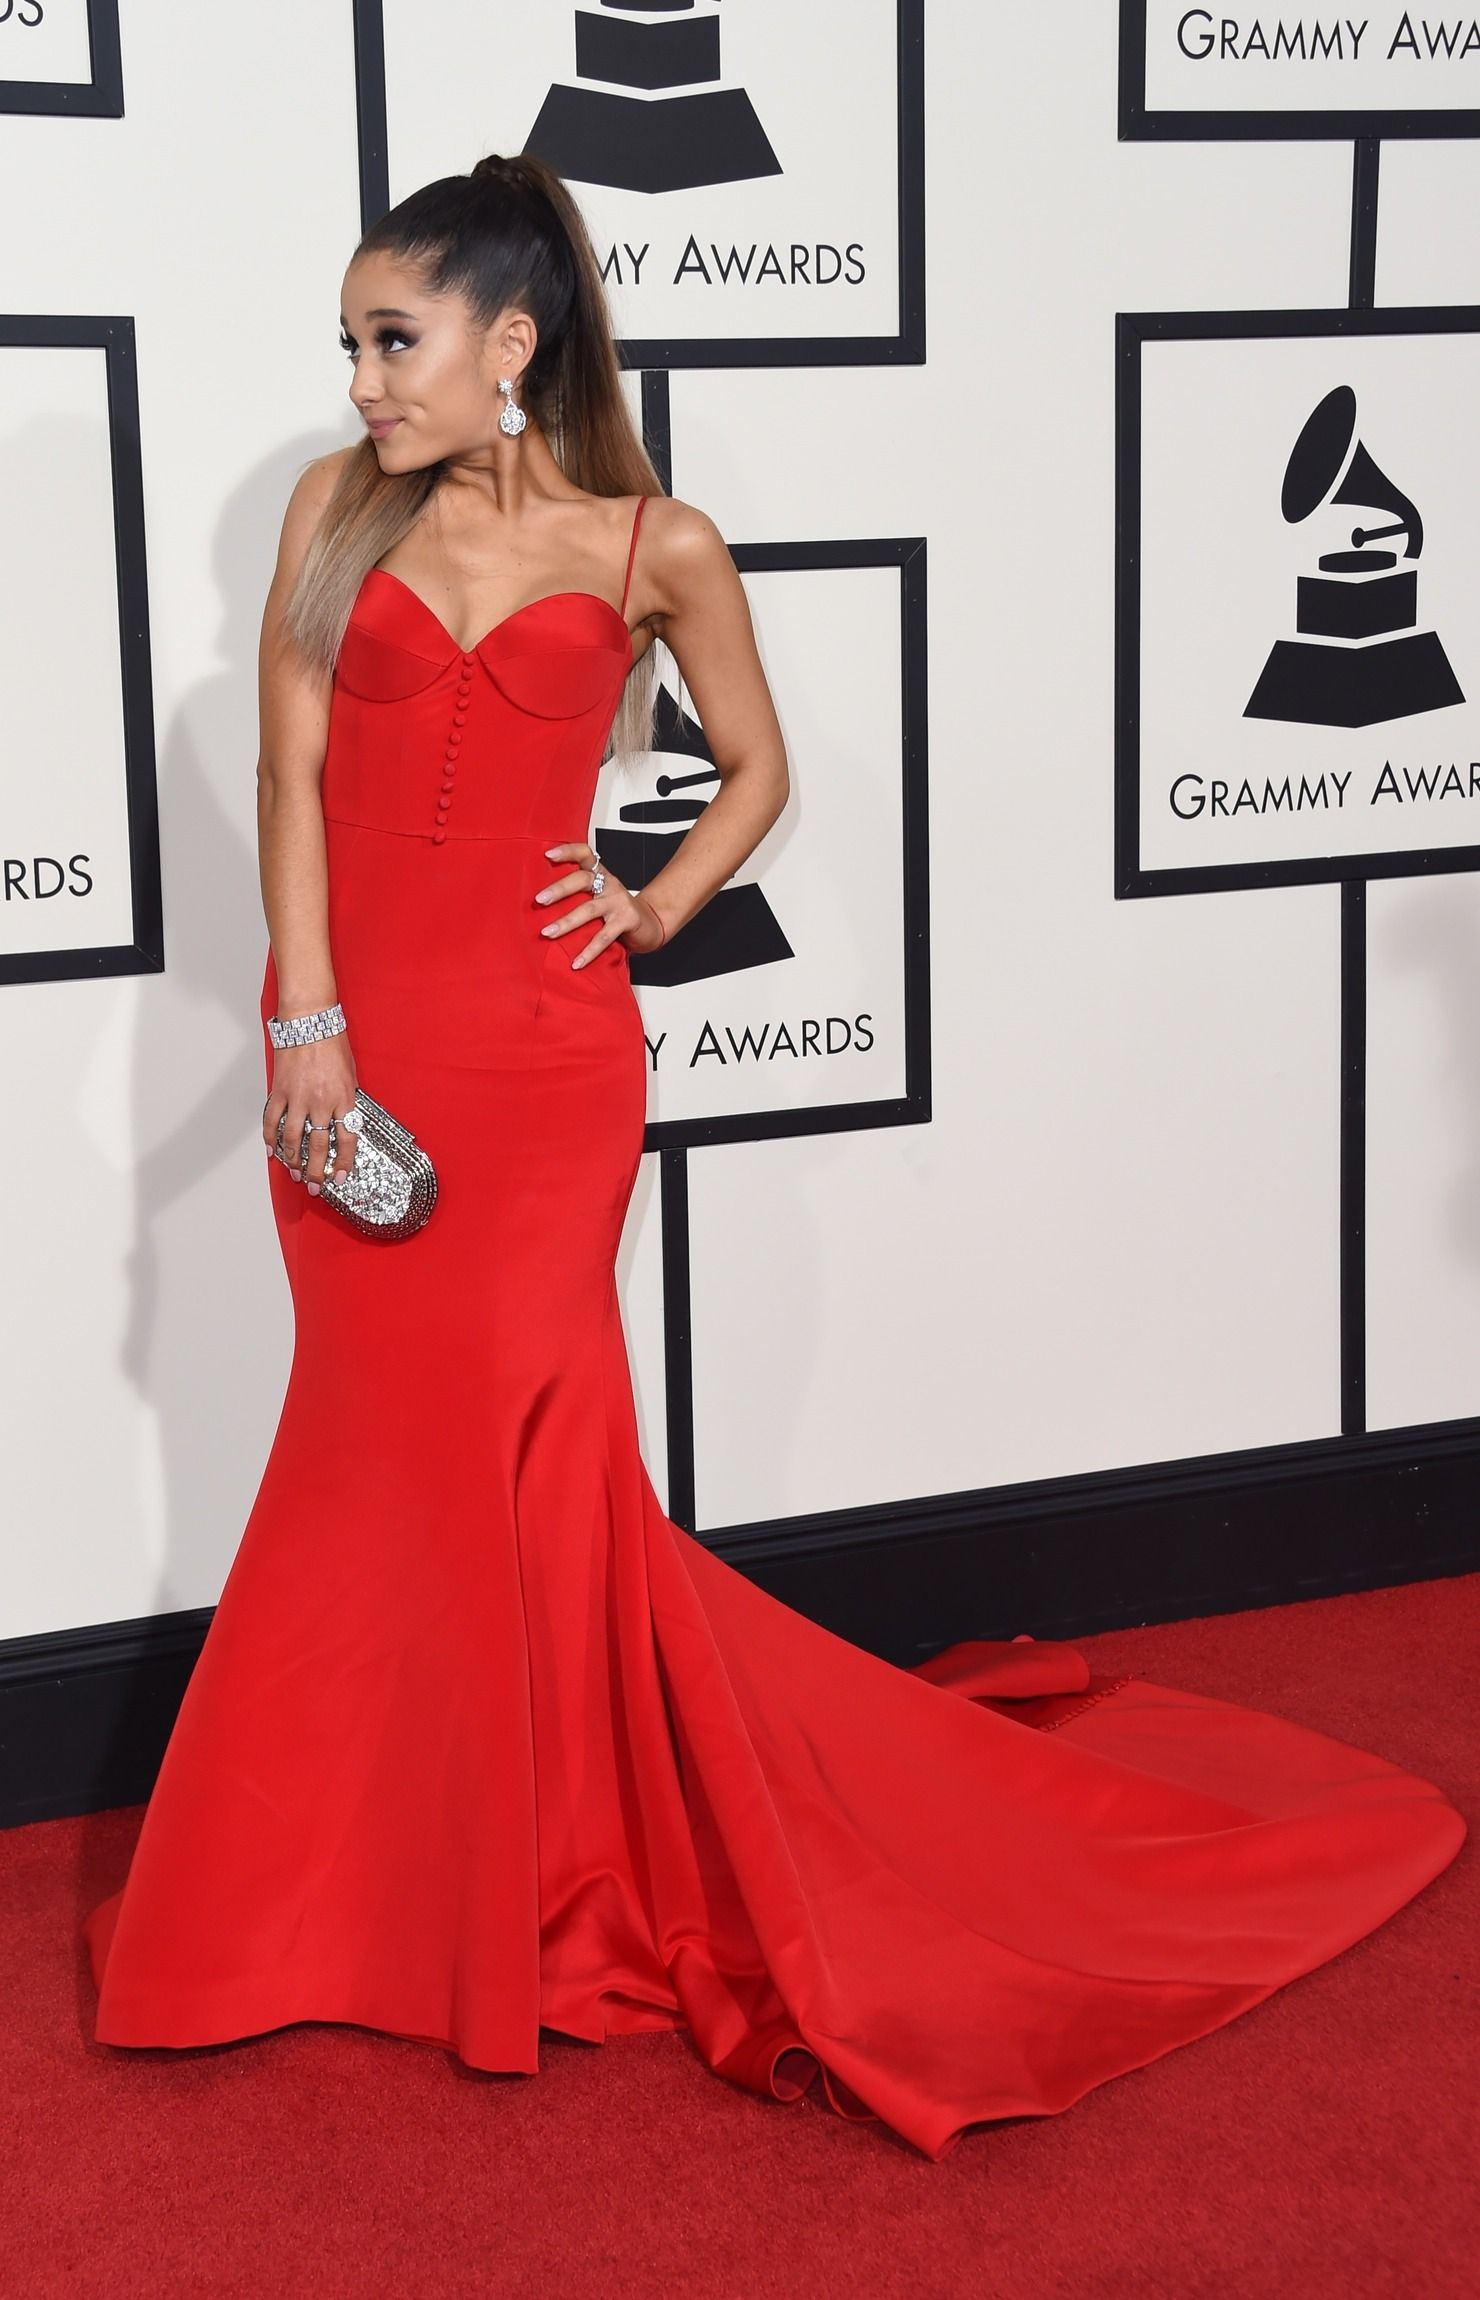 Ariana grande pink dress jimmy  Ariana Grandeus  Grammys Red Carpet Dress Is Simple u Stunning